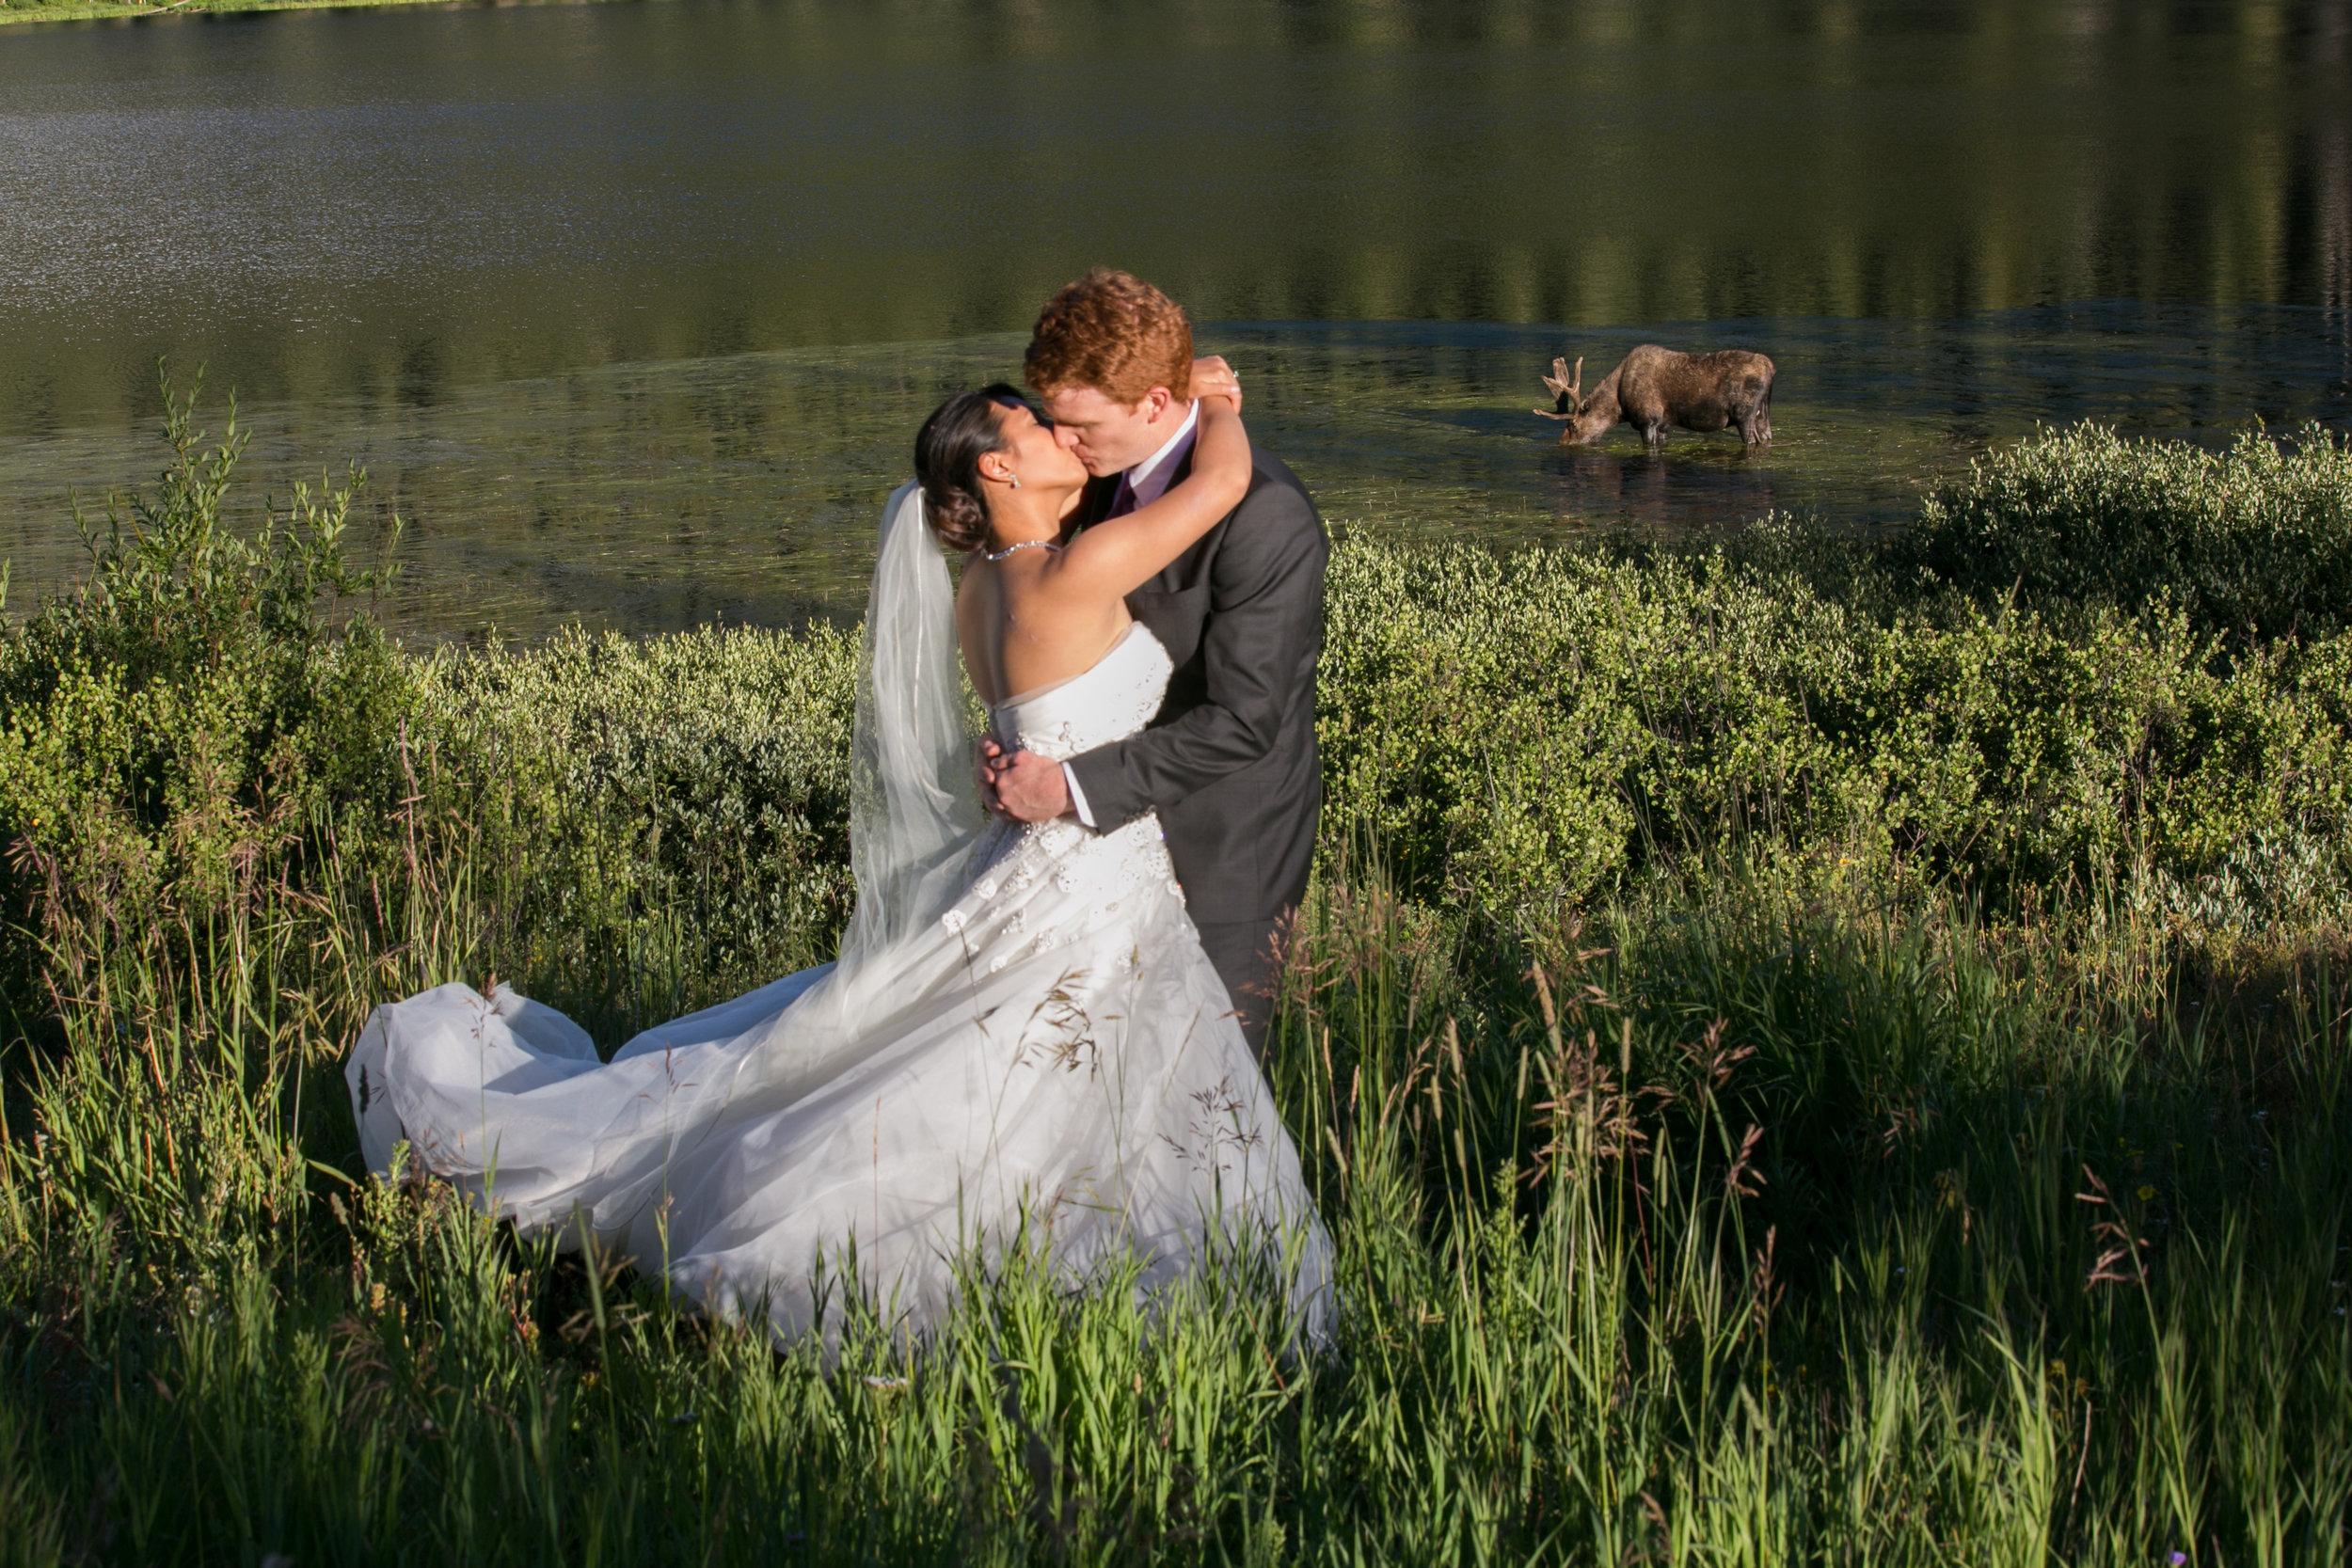 Colorado-best-wedding-photography-axelphoto.jpg